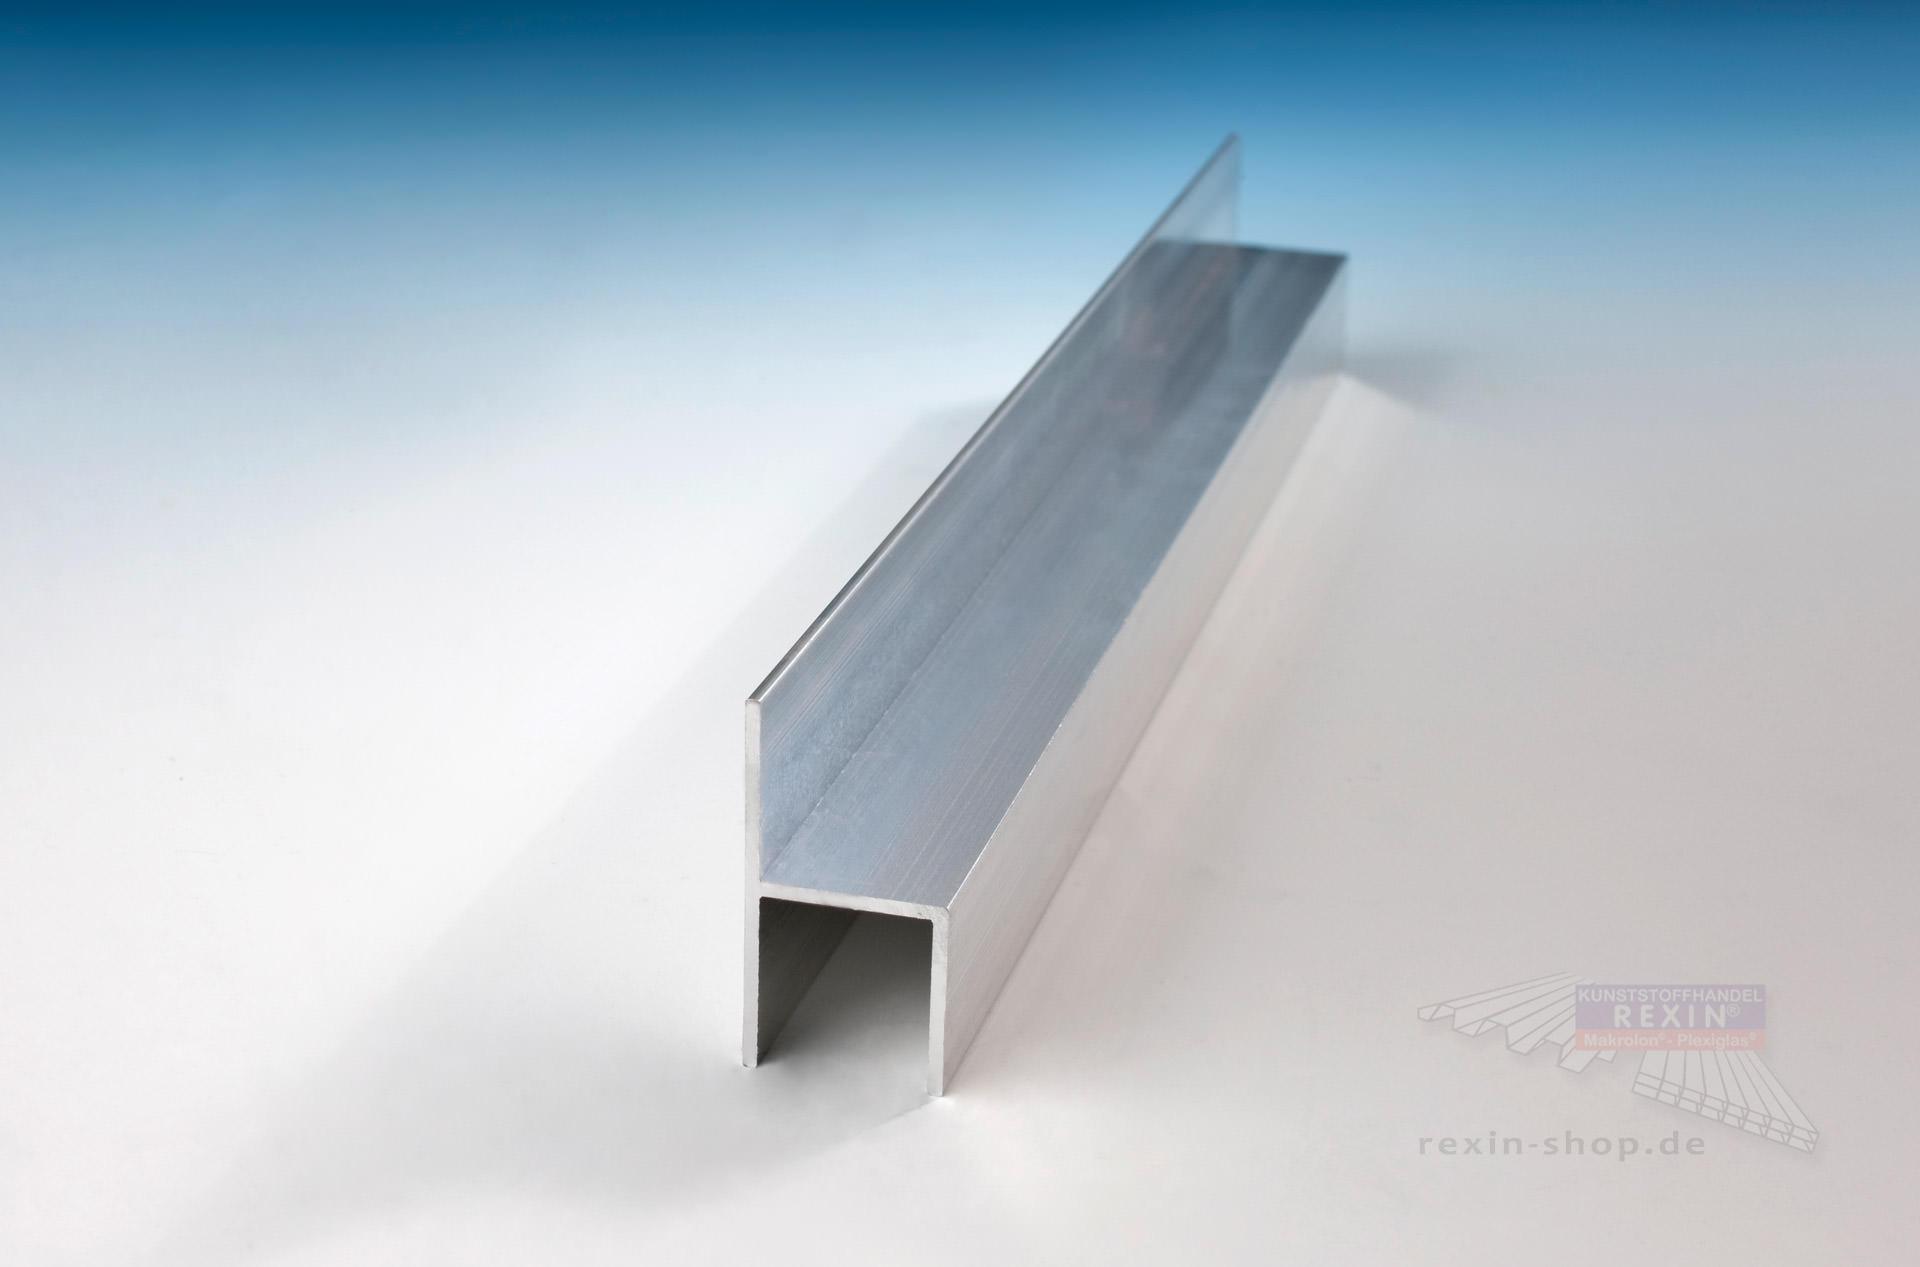 rexosystem alu stuhl profil f r 16mm platten pressblank rexosystem alu stuhl profil f r 16mm. Black Bedroom Furniture Sets. Home Design Ideas